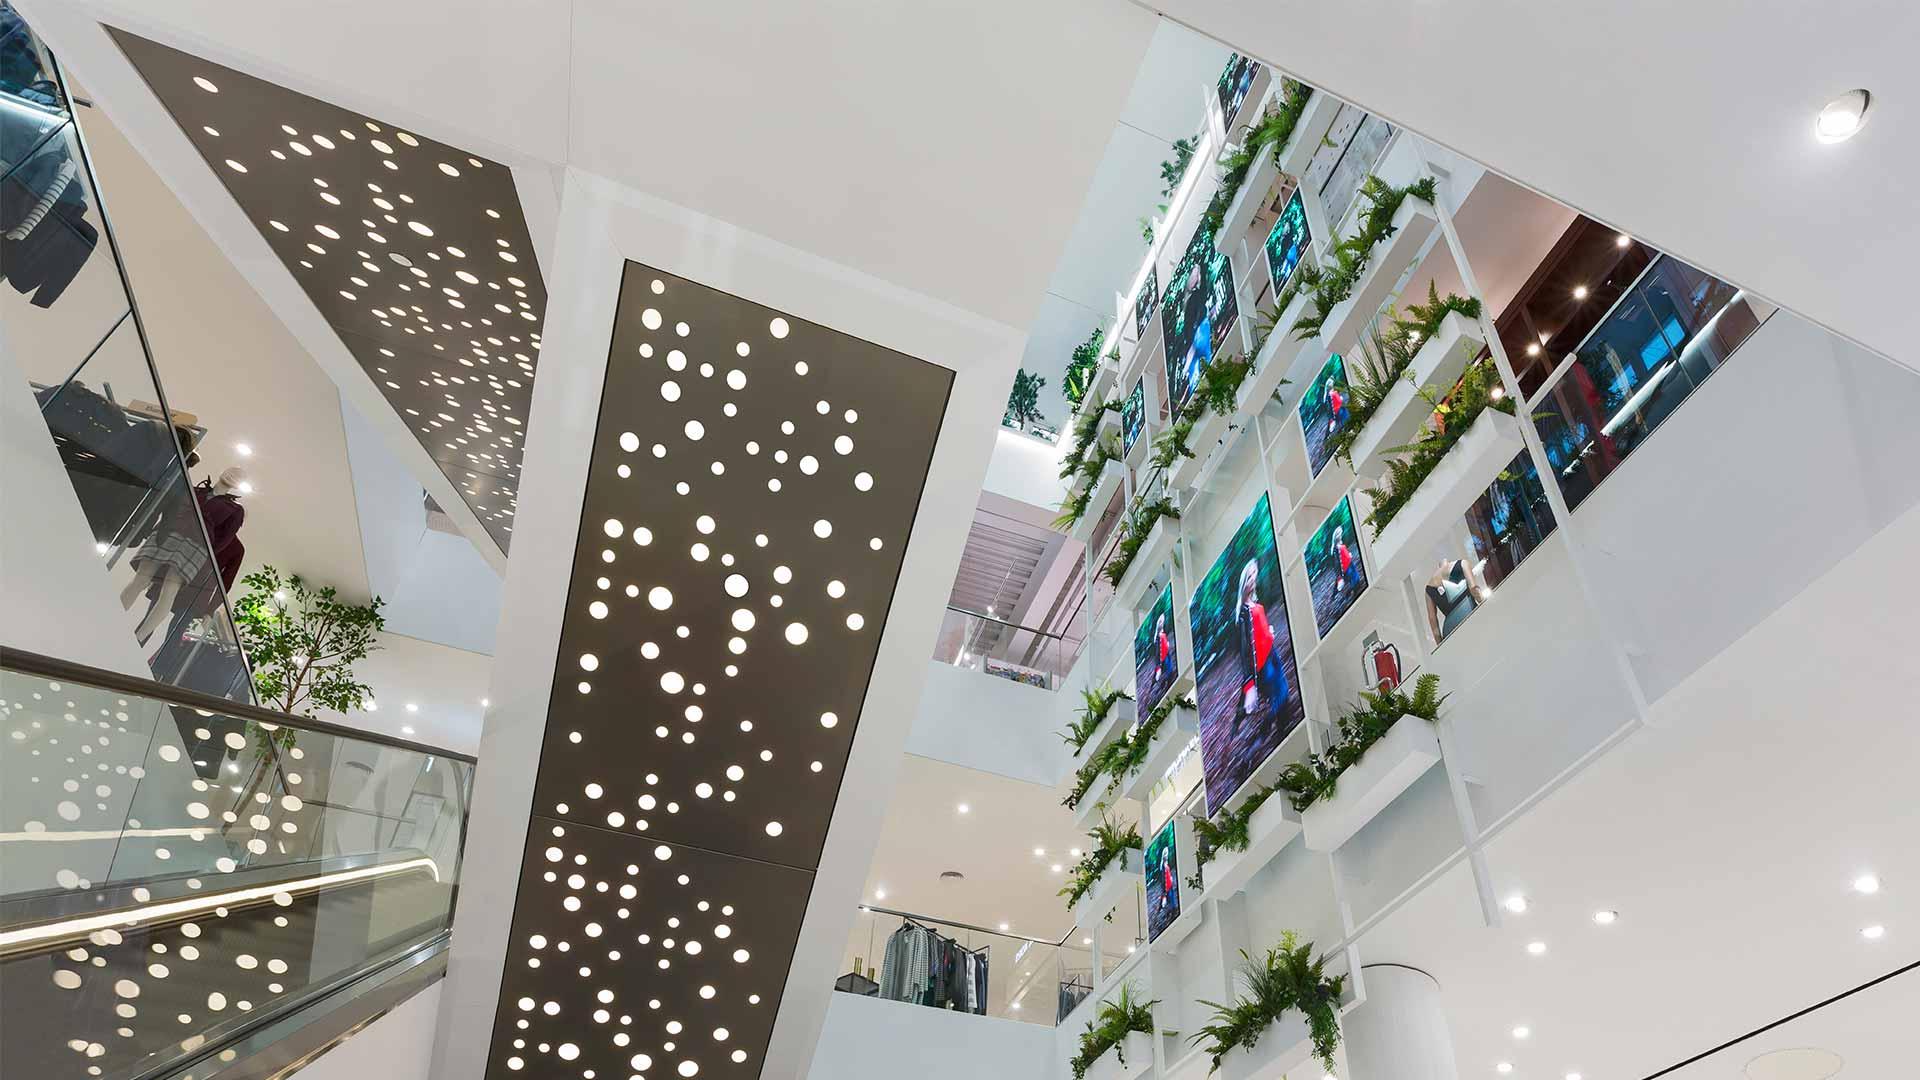 New Build Atrium Space Escalator Underside Perforated Detail Lighting Designers Nulty